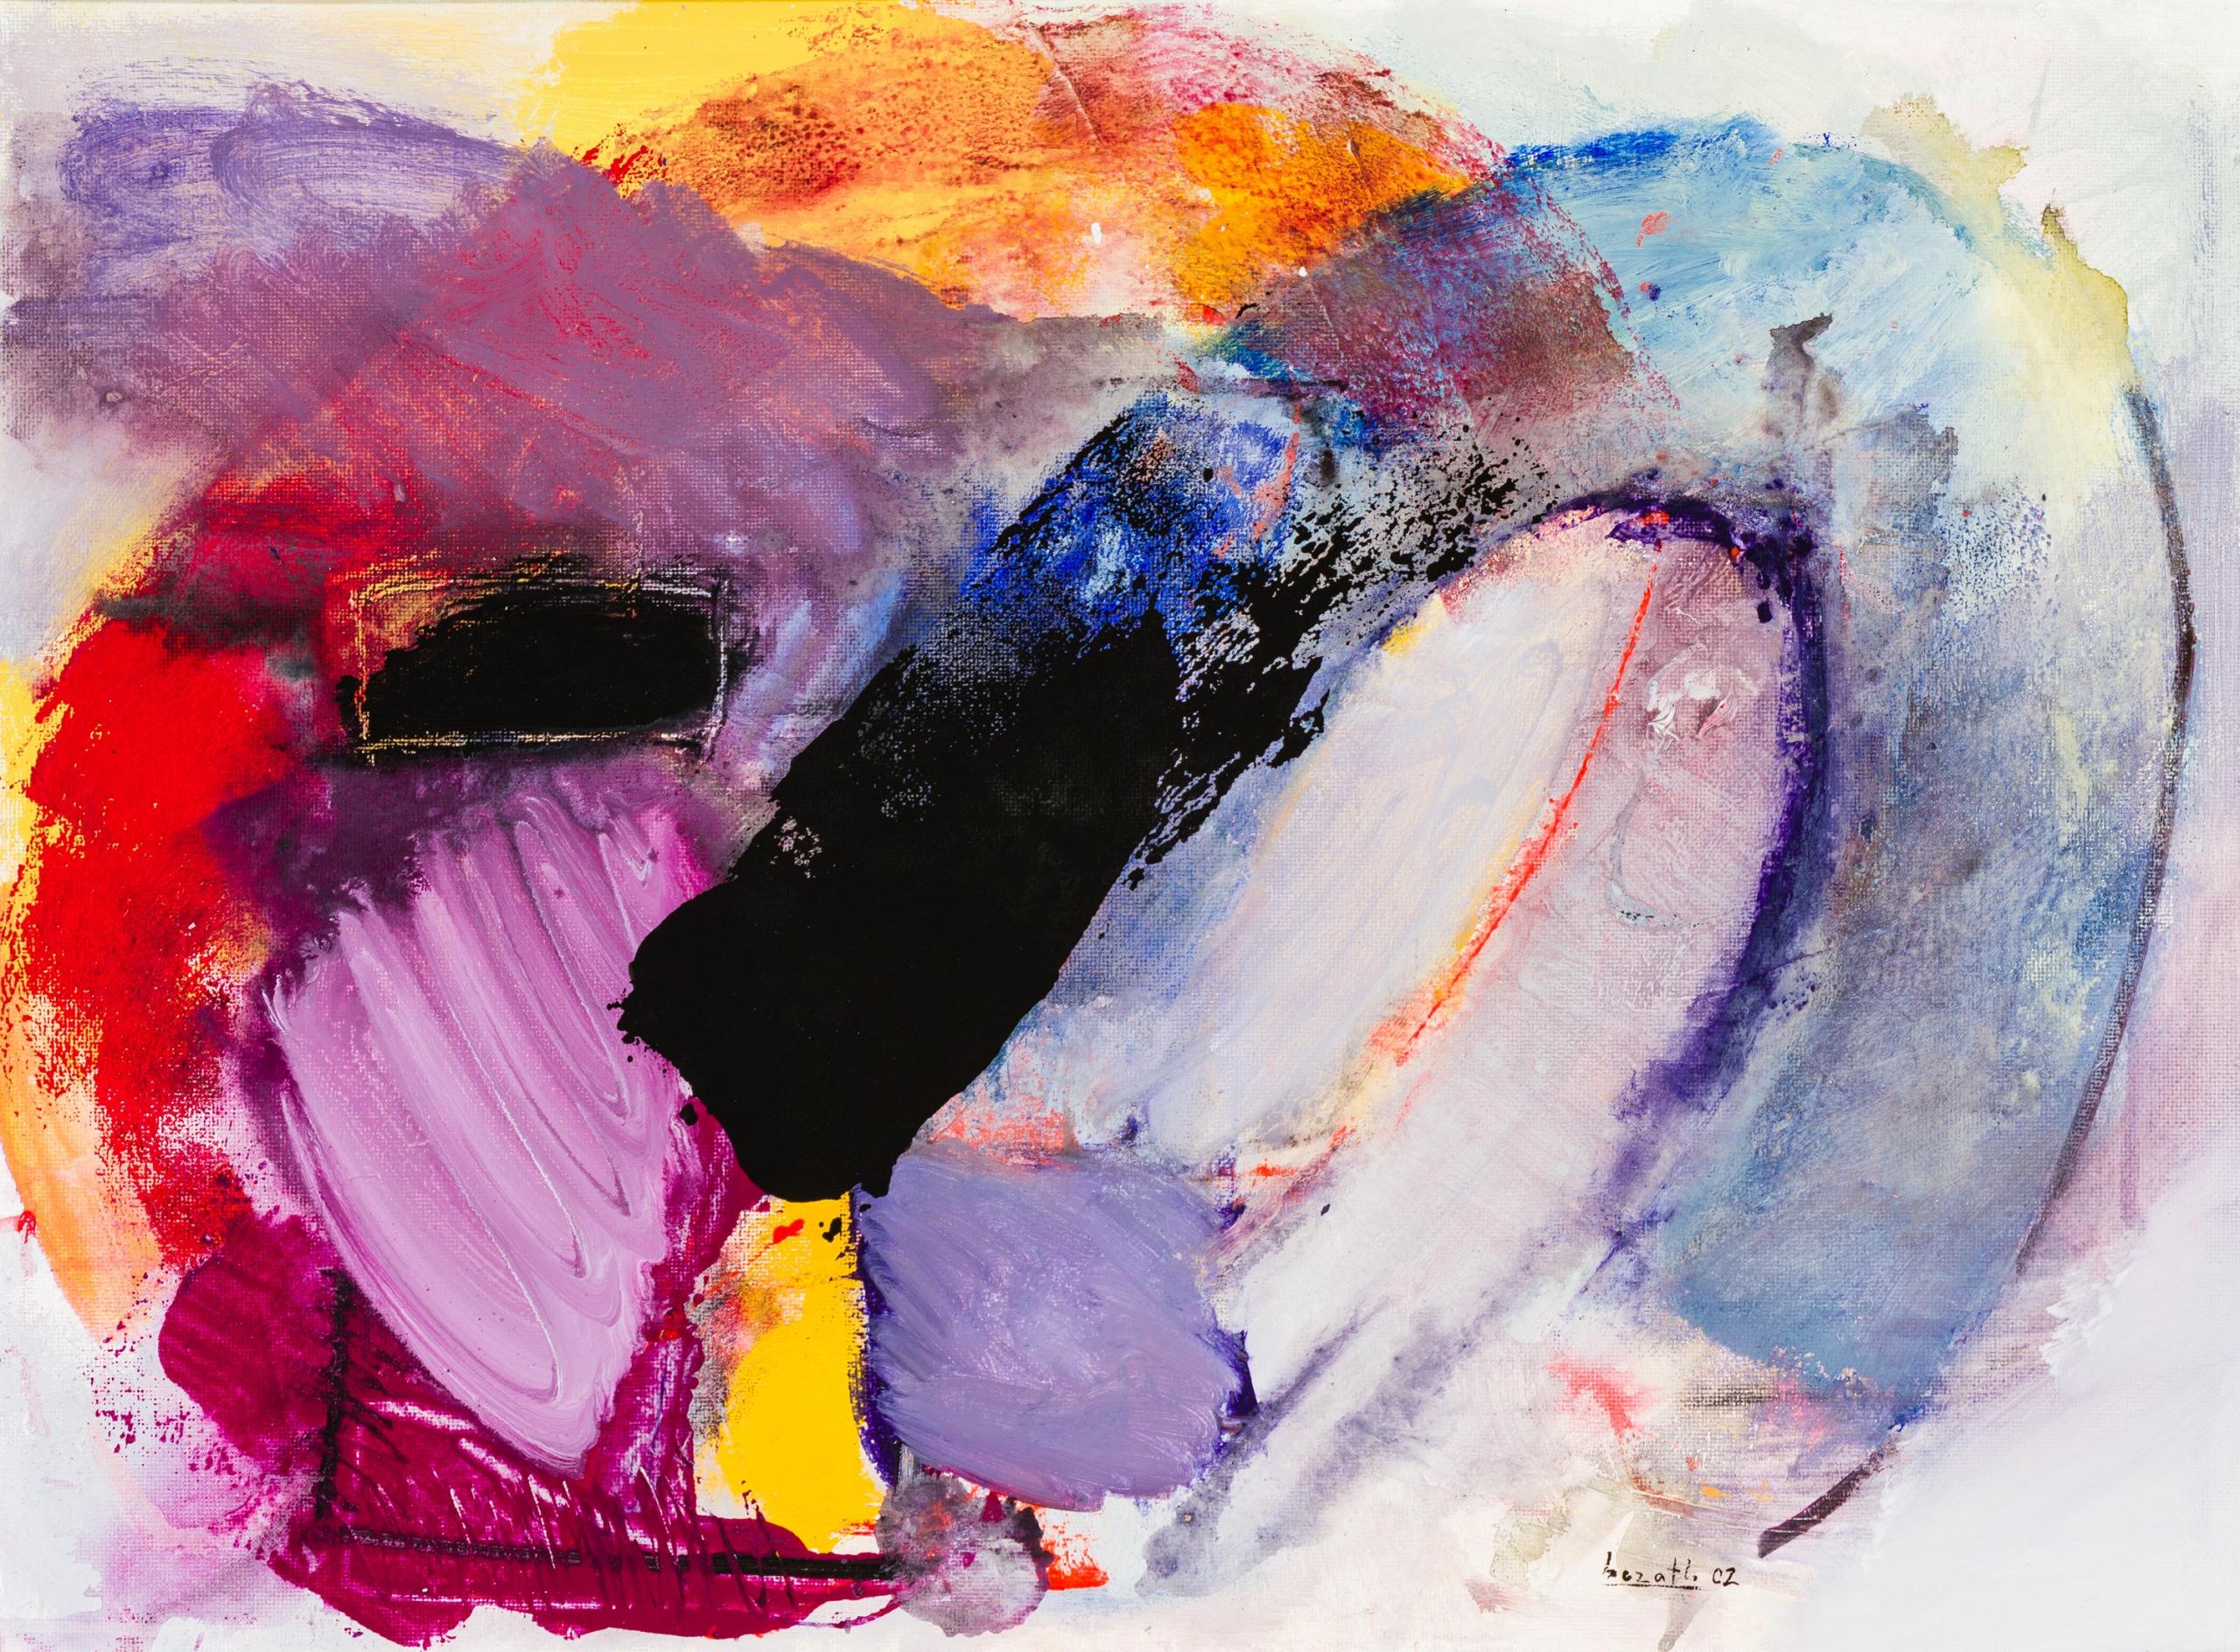 Sinasi Bozatli, Colours of Life